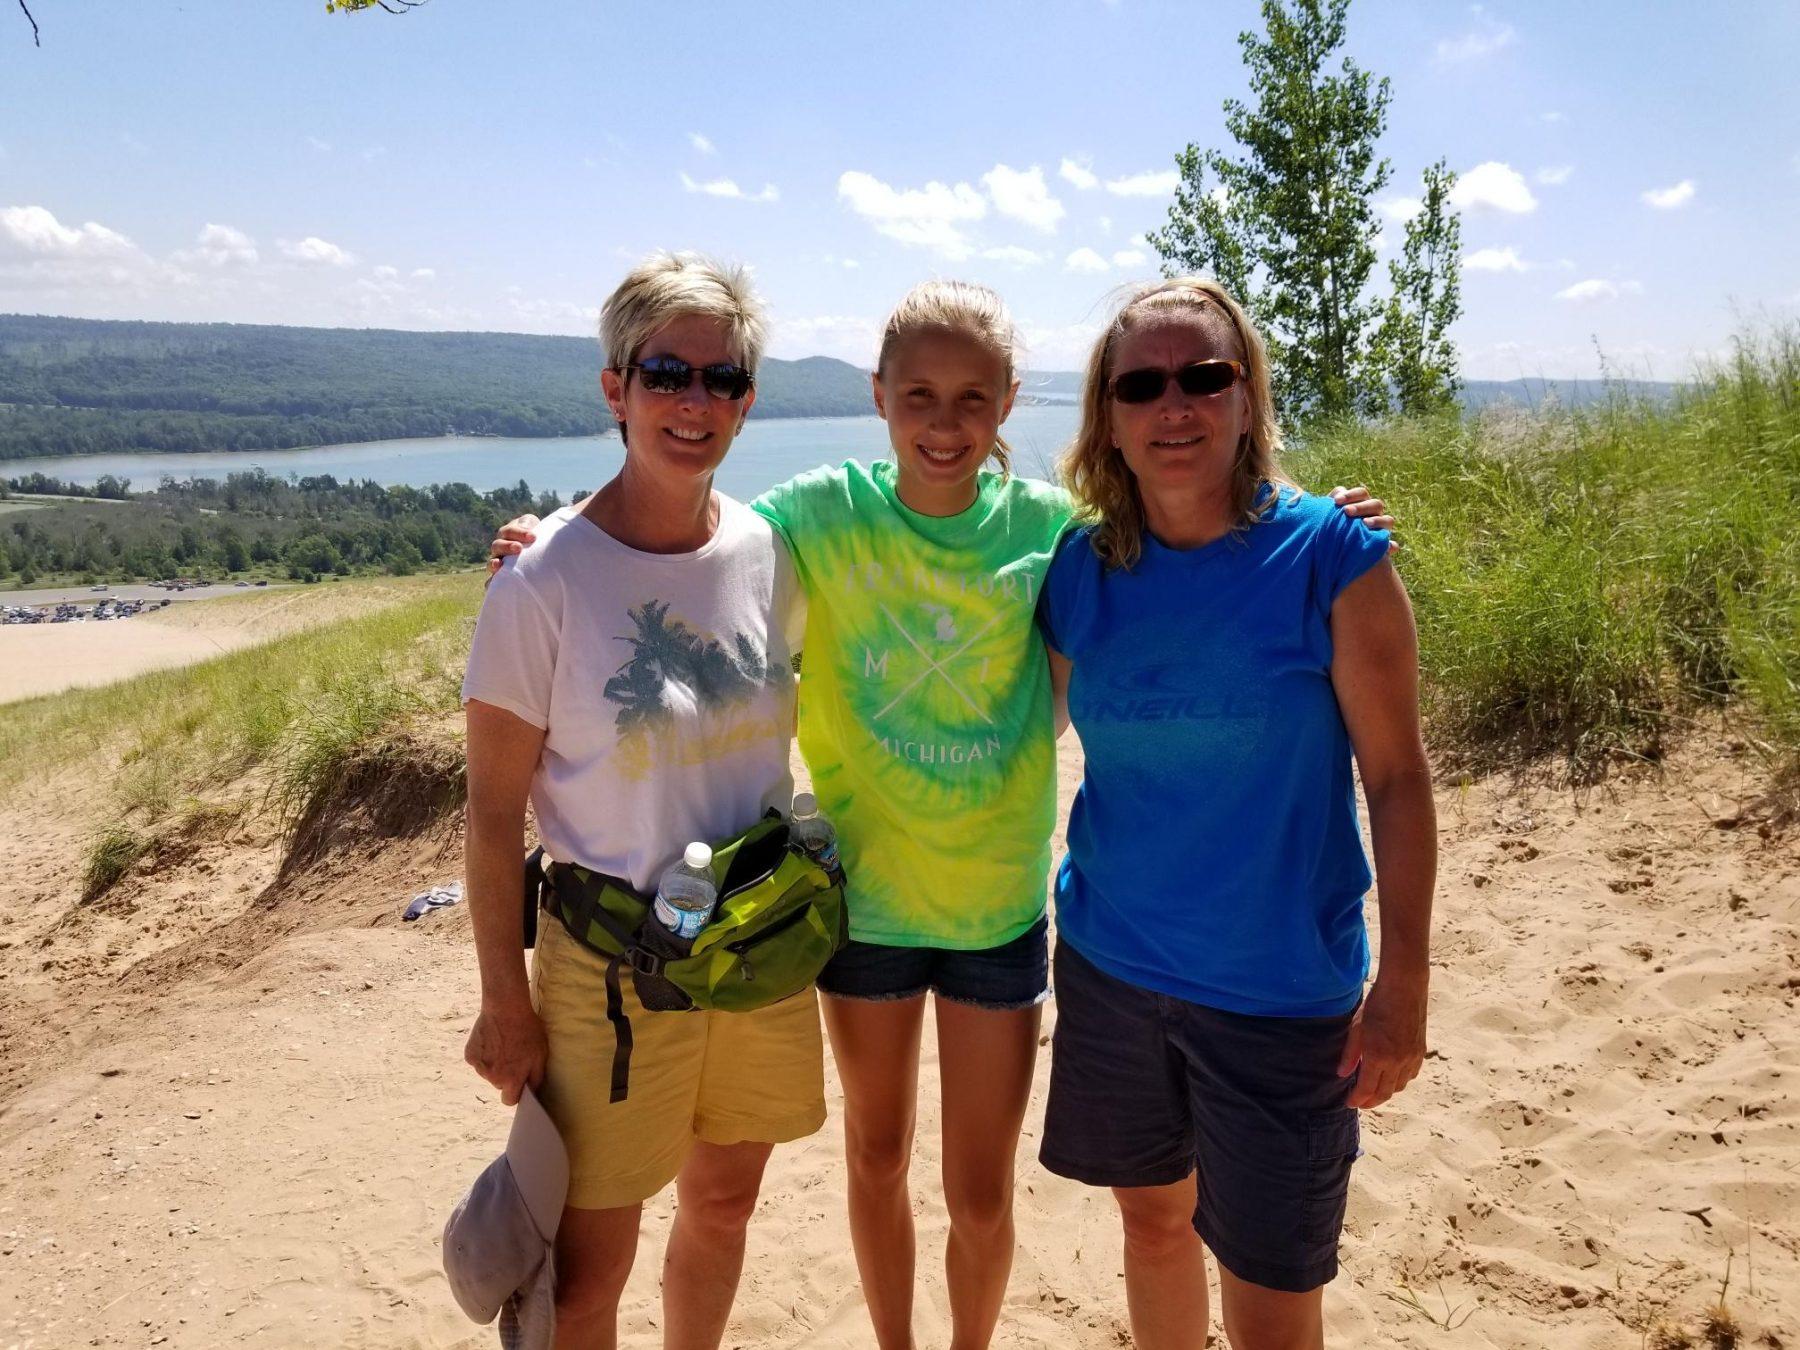 Kim Peters family